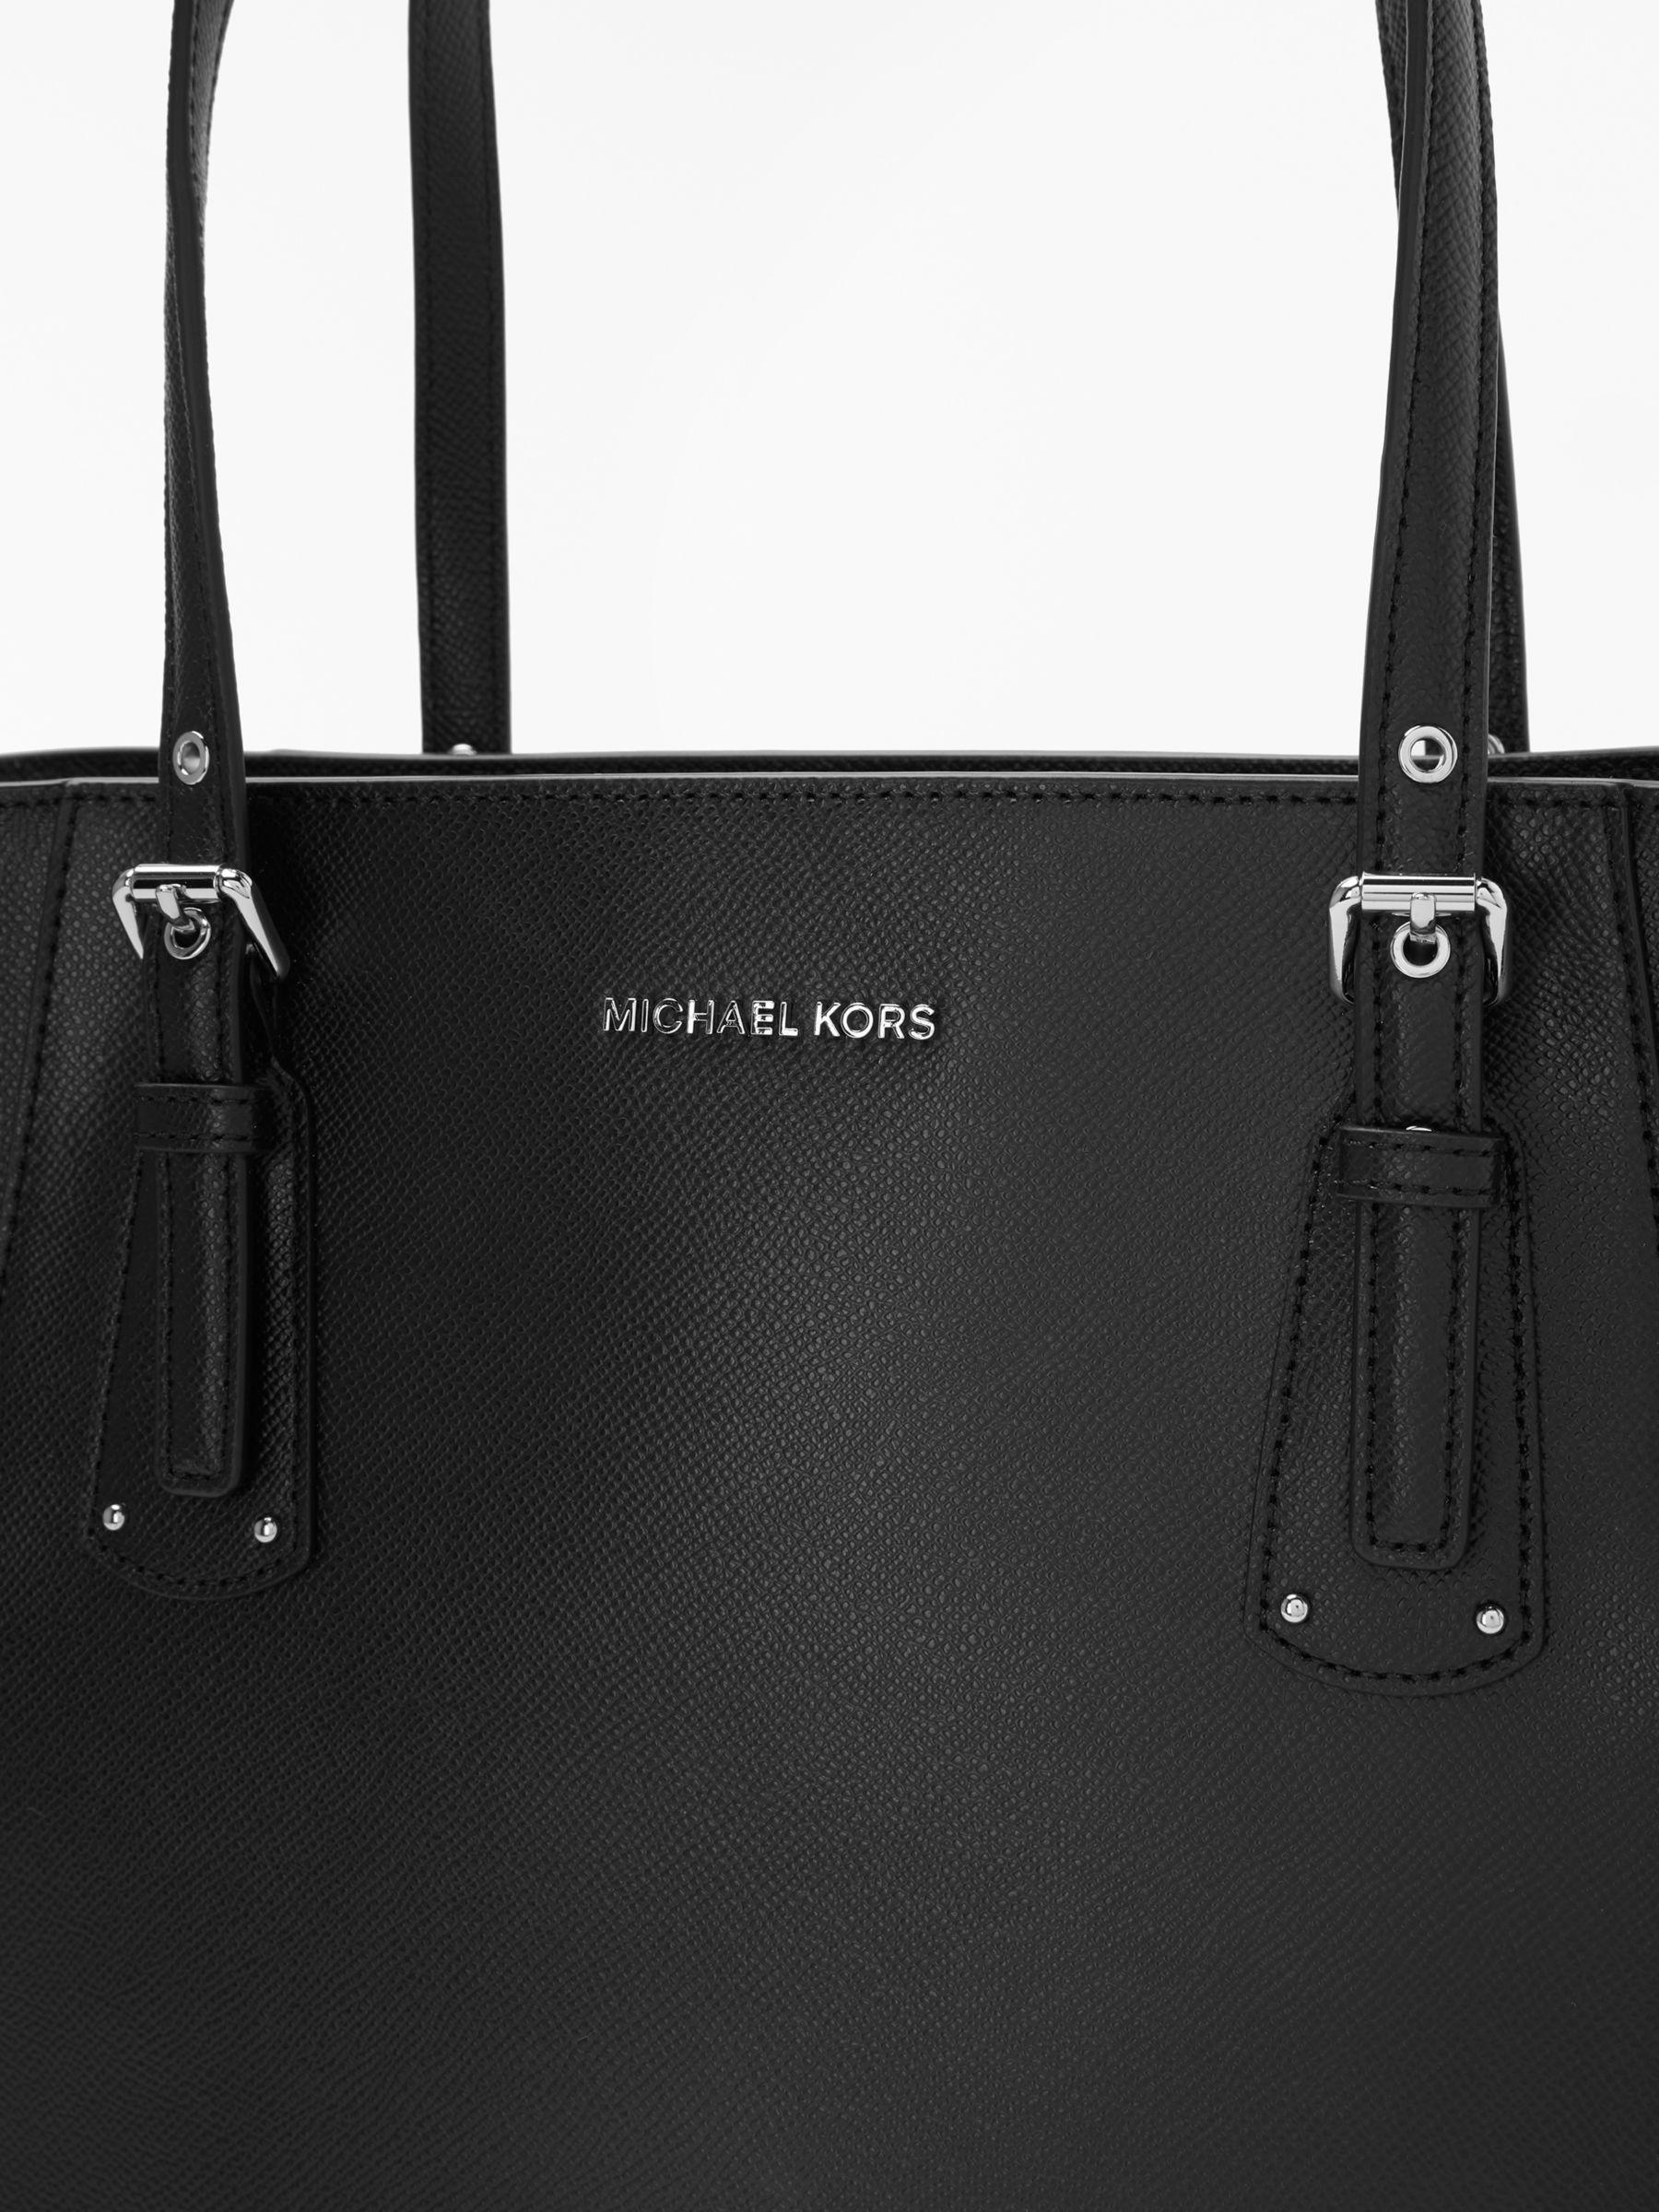 11717933e2fe Michael Kors - Black Michael Voyager East West Leather Tote Bag - Lyst.  View fullscreen